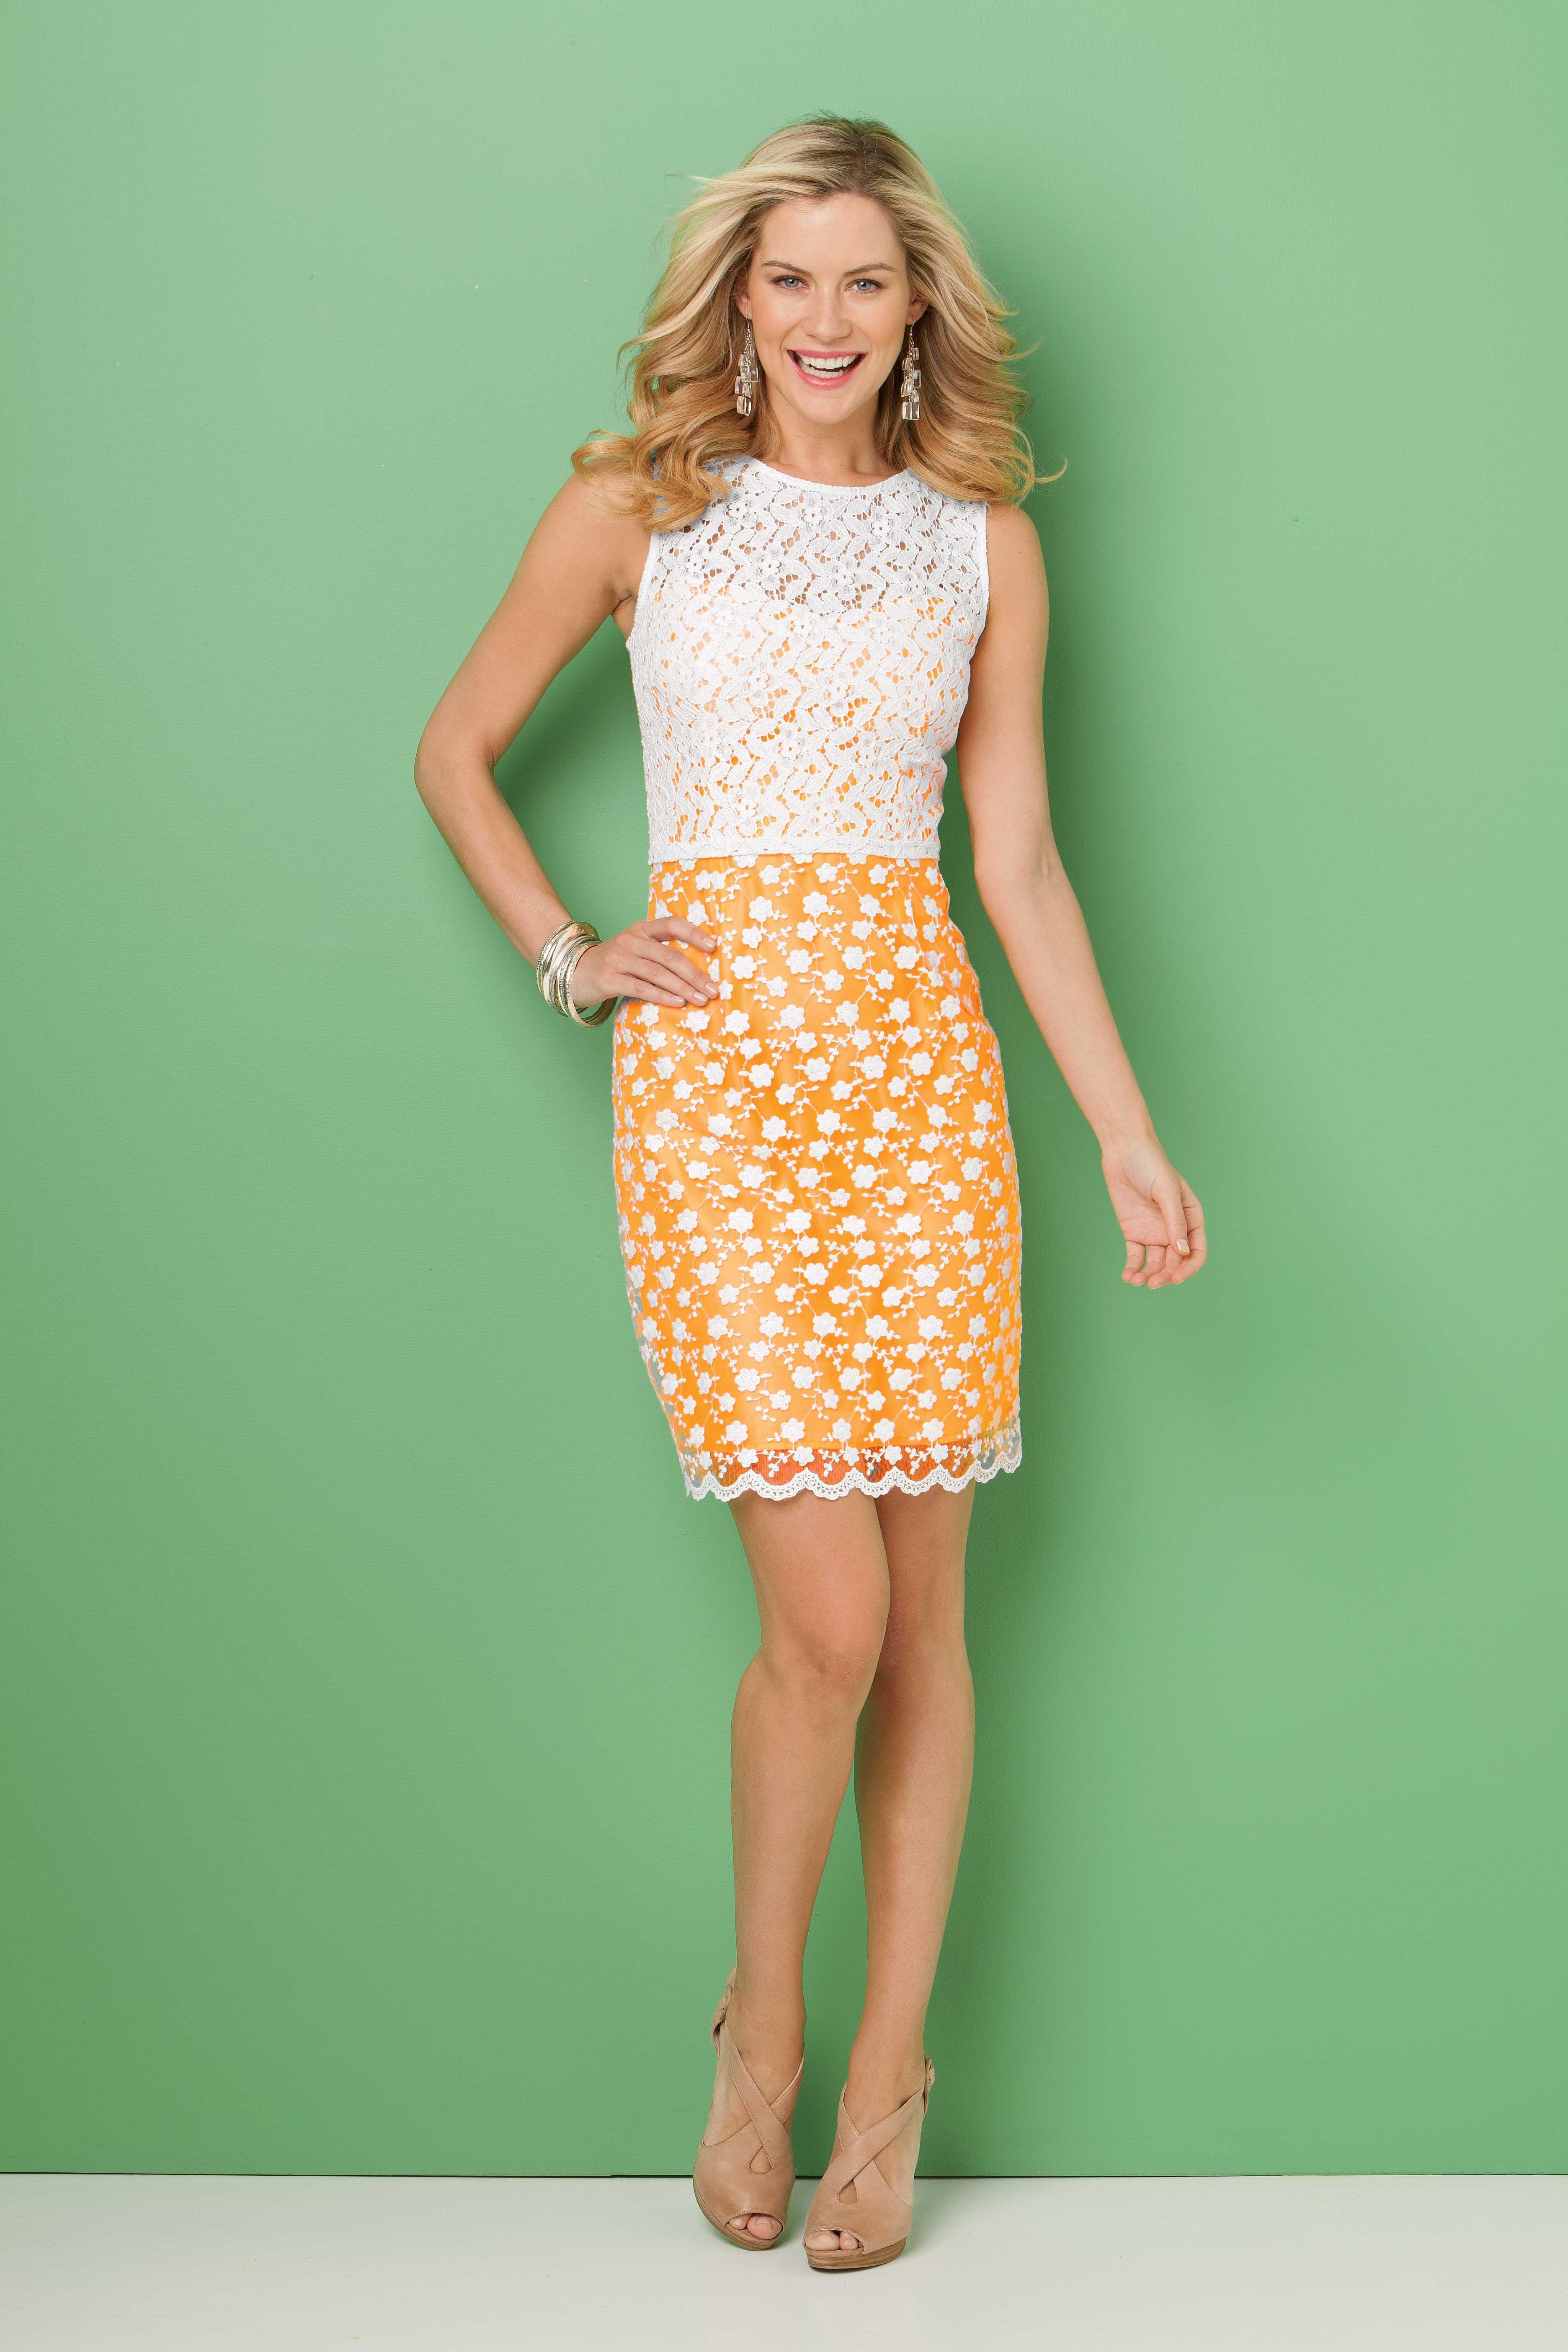 Two Tone Crochet Dress For Fabulous Steinmart Clothes For Women Fashion Womens Dresses [ 5616 x 3744 Pixel ]